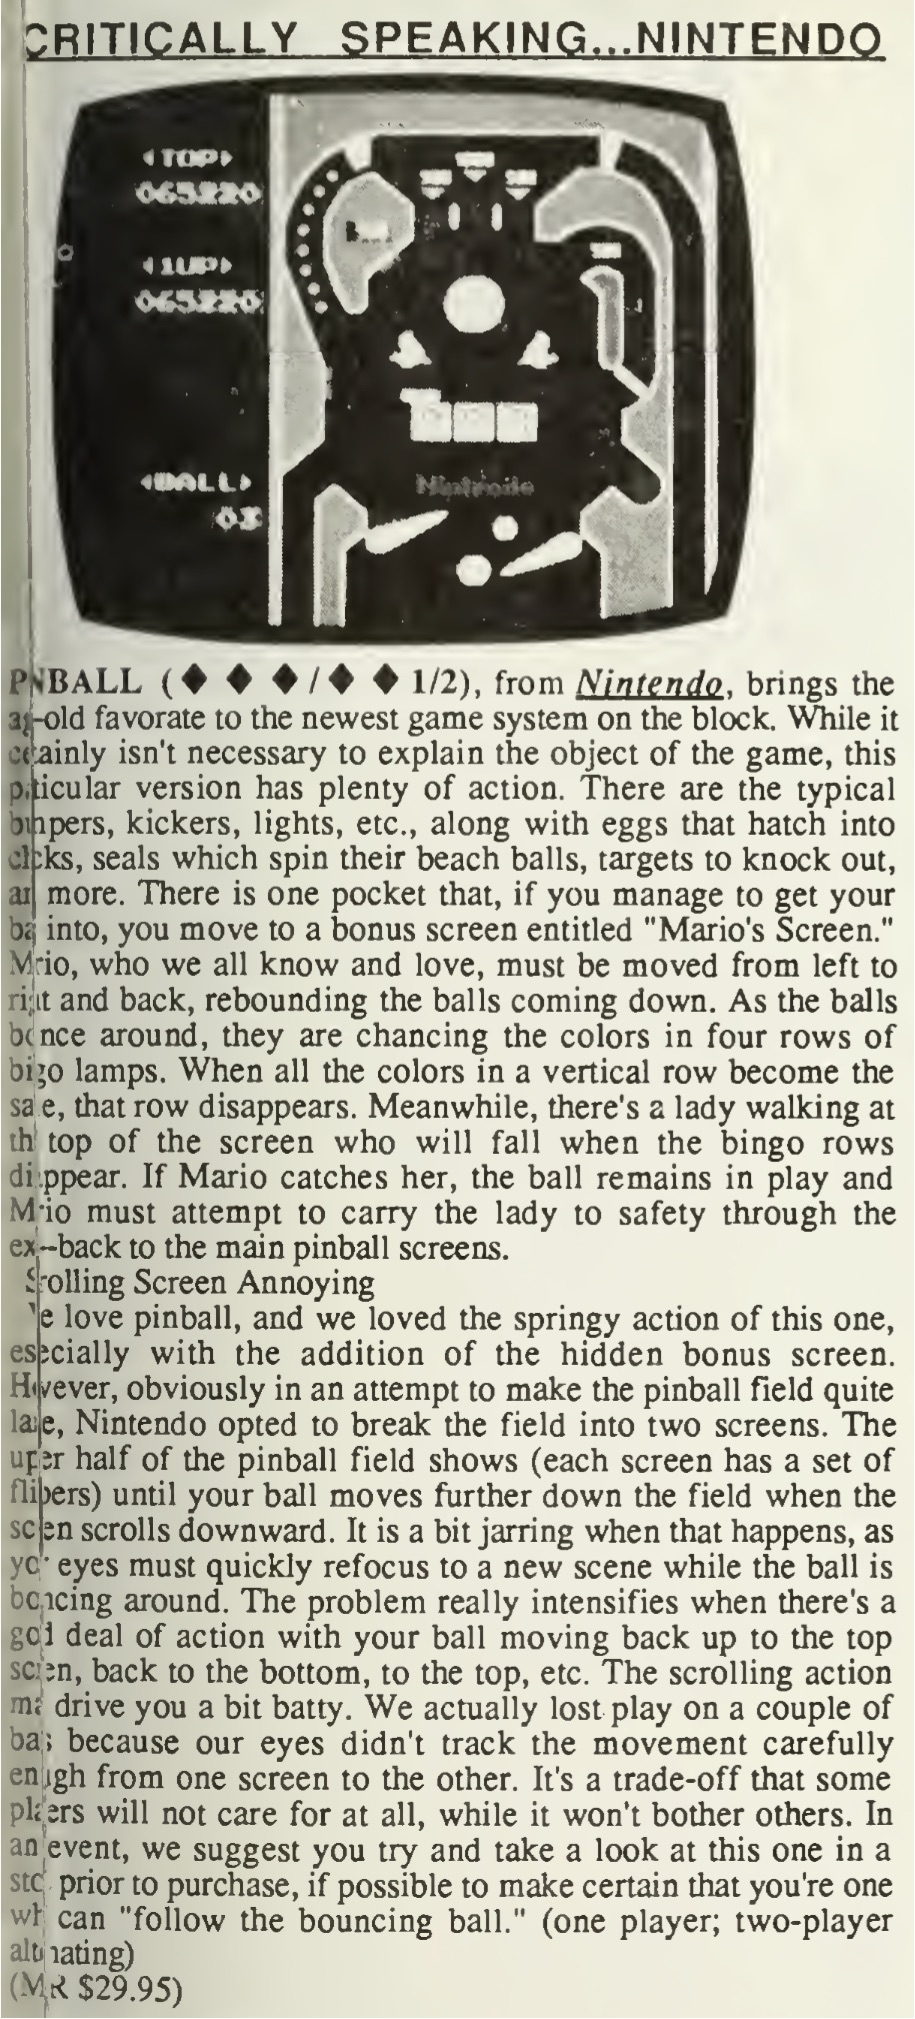 Pinball Review - Computer Entertainer - May 1986